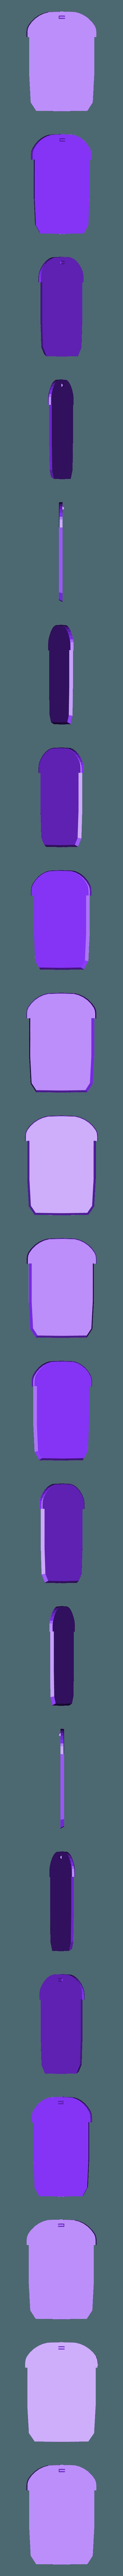 Ryobi-Adapter-bottom.stl Download free STL file Ryobi Battery Pack to AC Adapter • 3D print object, MeesterEduard